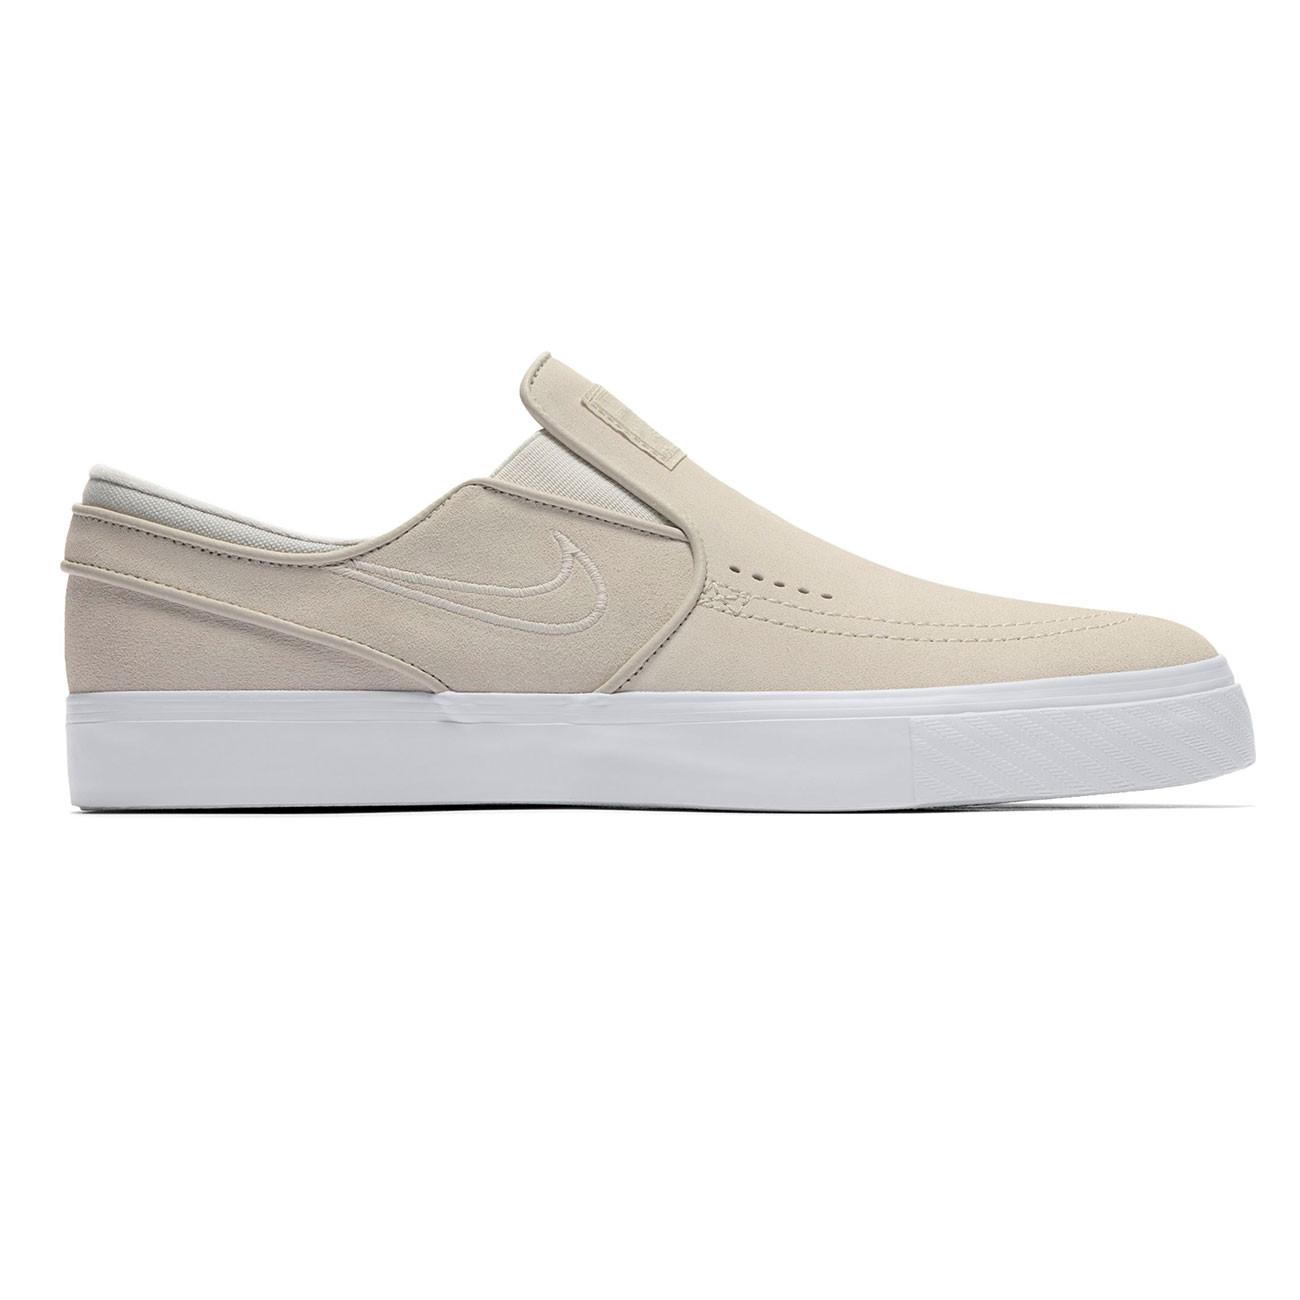 157ad50f4e4c Sneakers Nike SB Zoom Stefan Janoski Slip white light bone-white ...